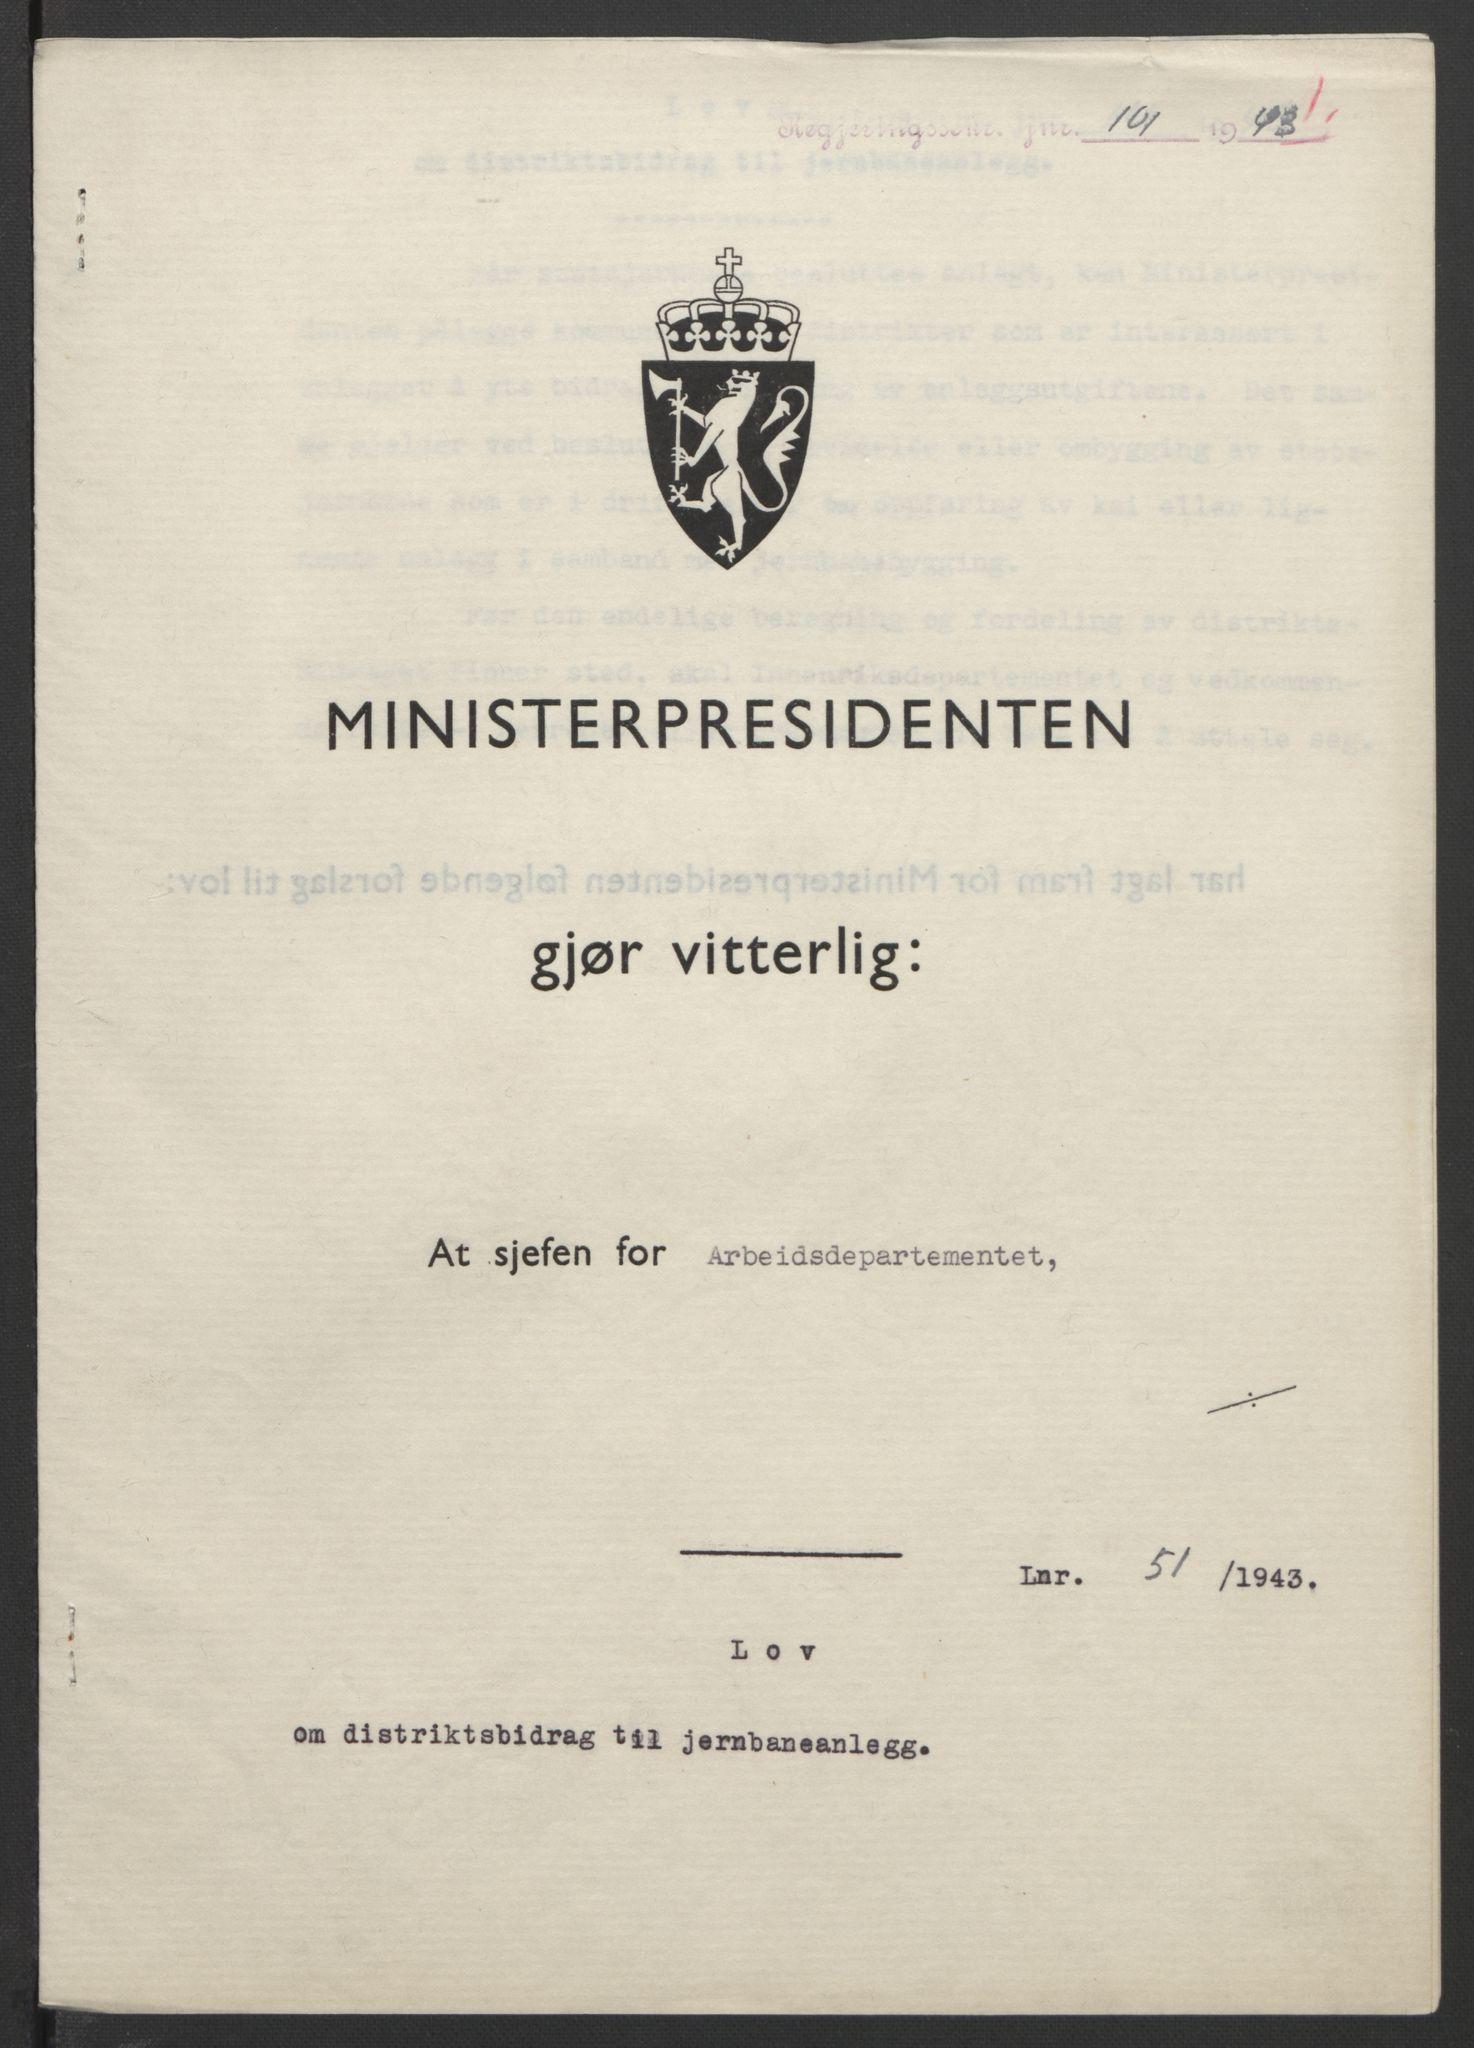 RA, NS-administrasjonen 1940-1945 (Statsrådsekretariatet, de kommisariske statsråder mm), D/Db/L0099: Lover, 1943, s. 223